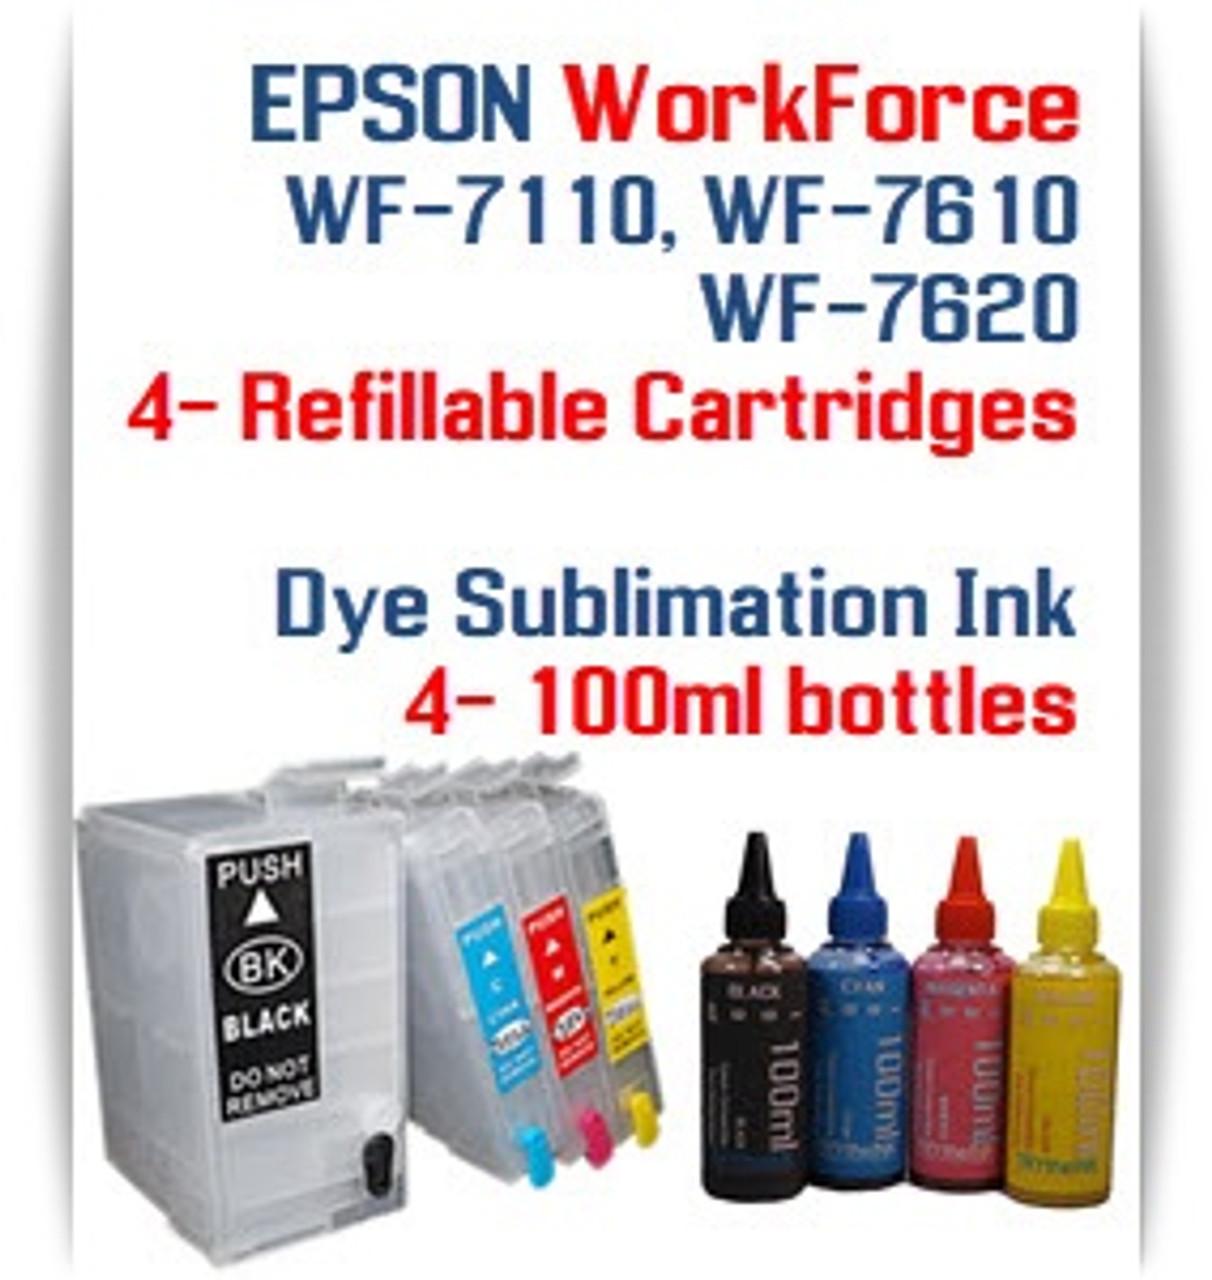 4 Refillable Ink Cartridges (empty) 4 100ml Dye Sublimation Ink Package Epson WorkForce WF-7110, WF-7610, WF-7620 printers